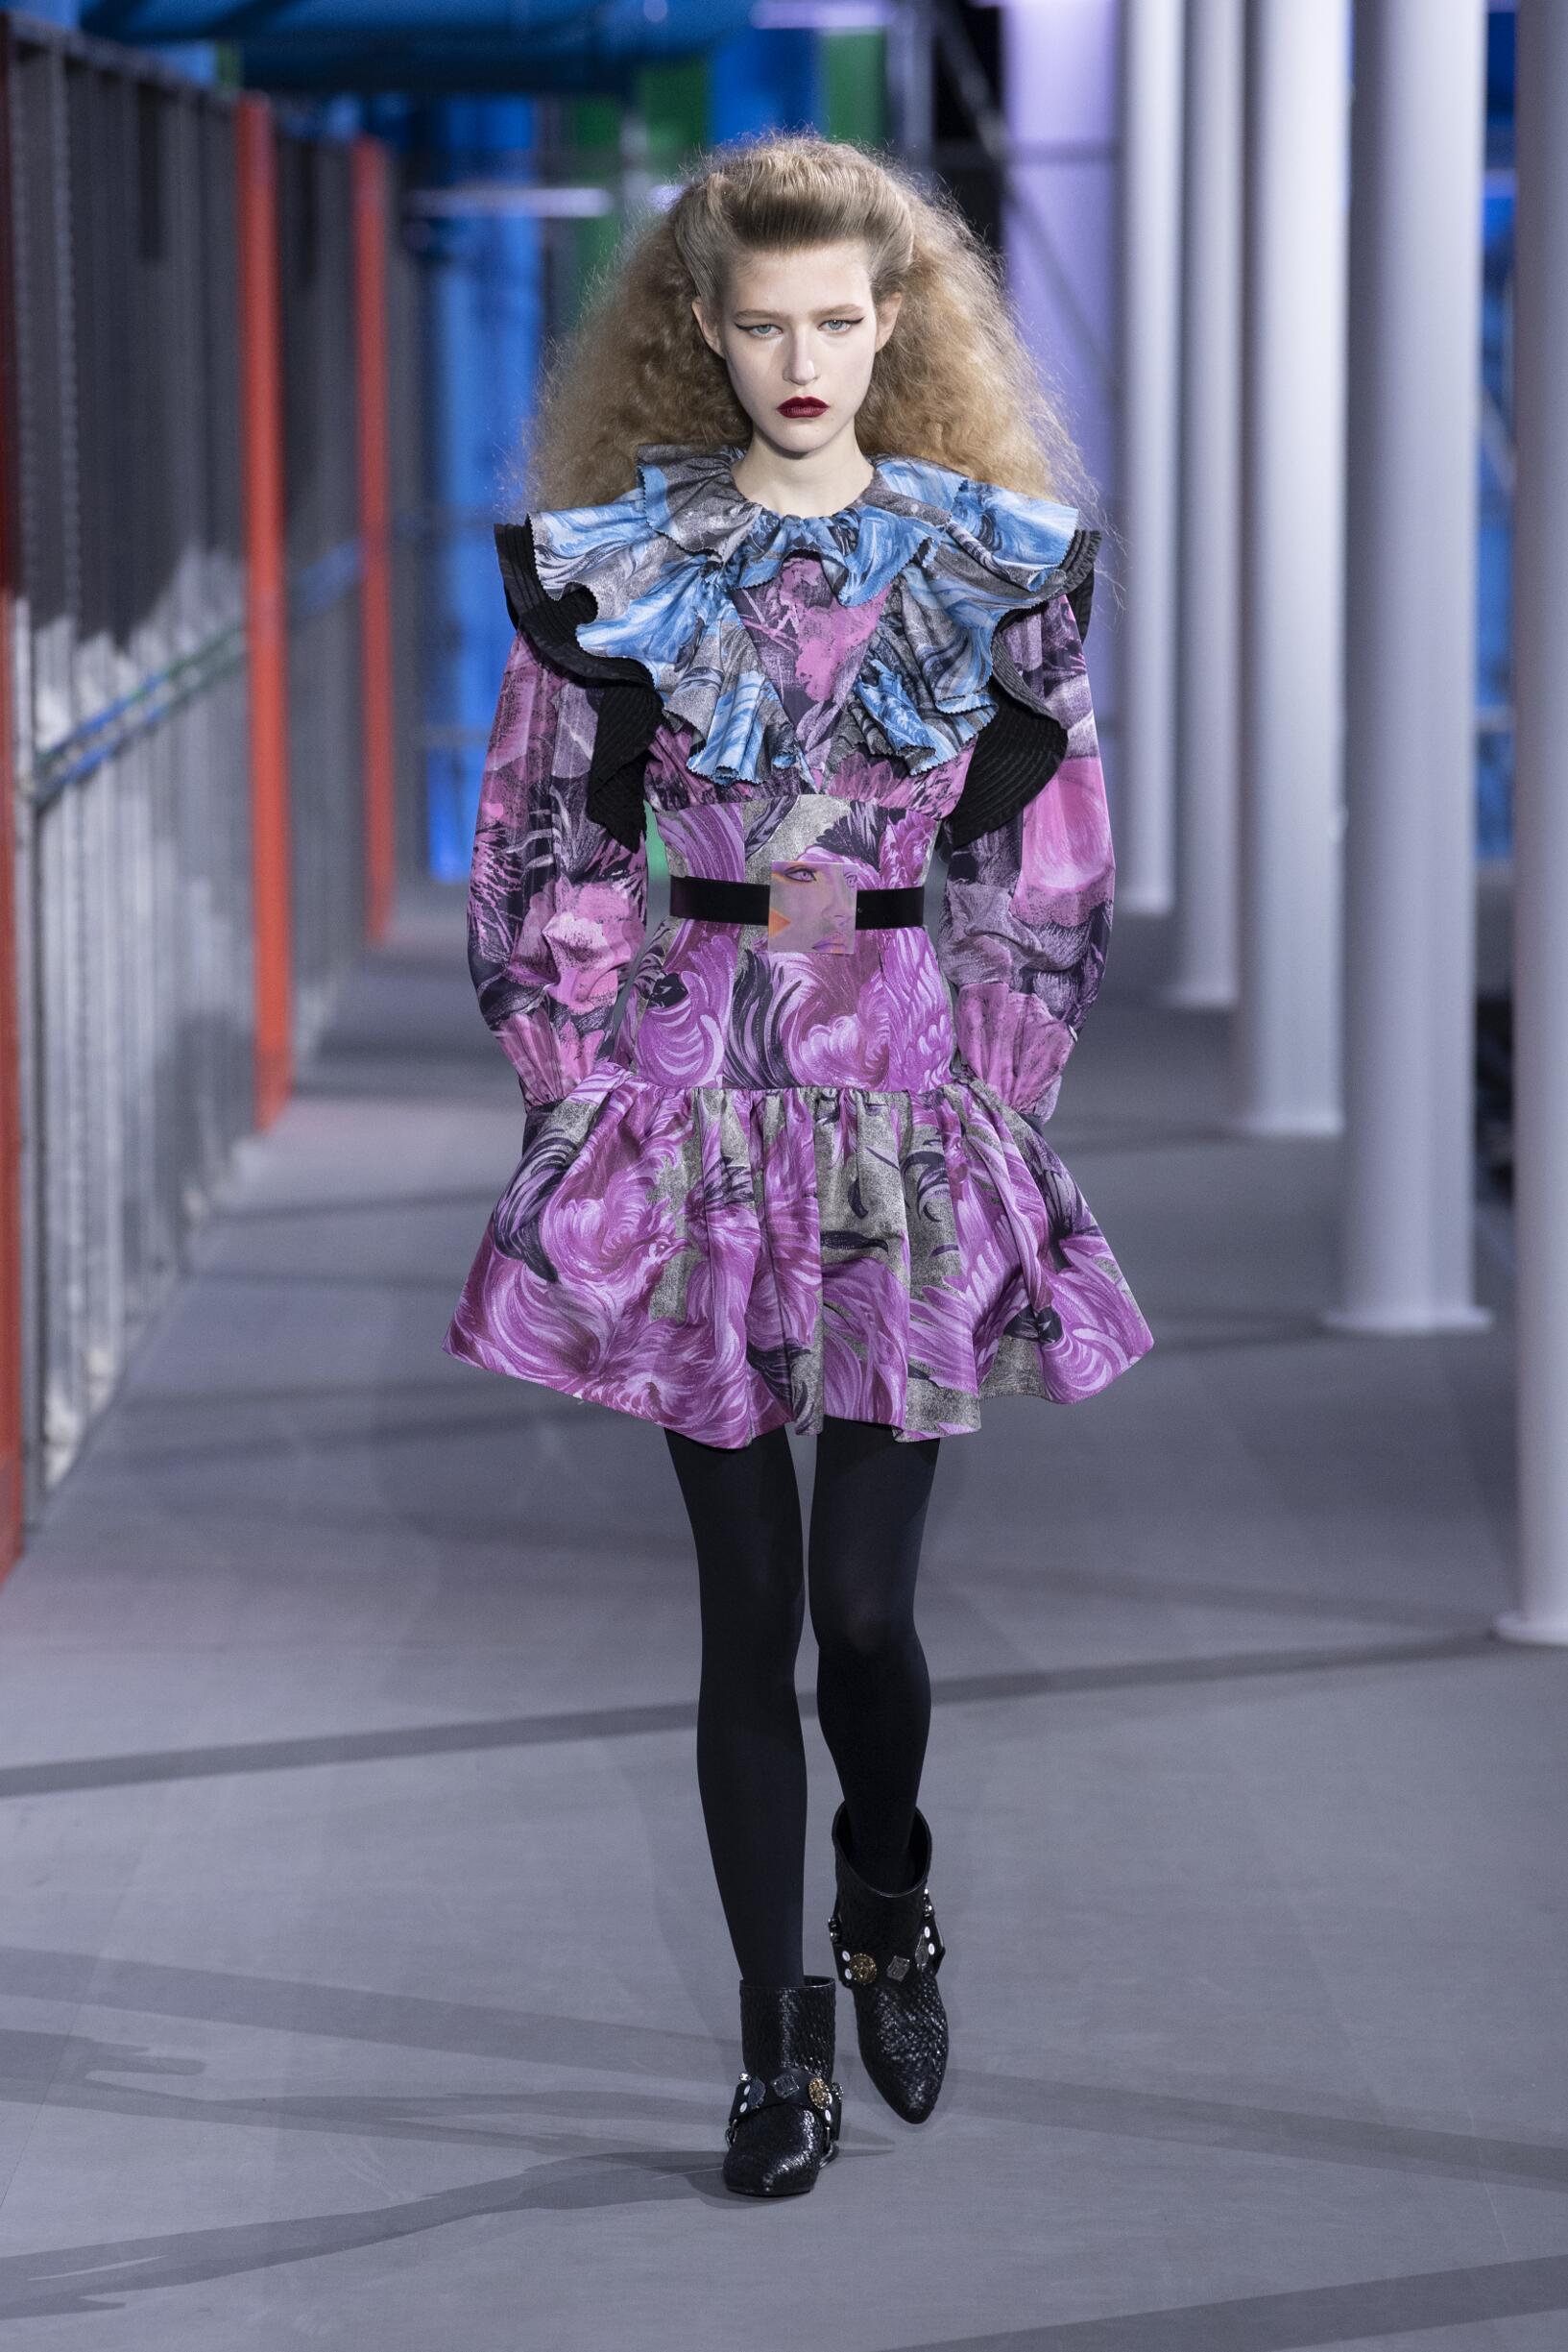 Winter 2019 Fashion Trends Louis Vuitton